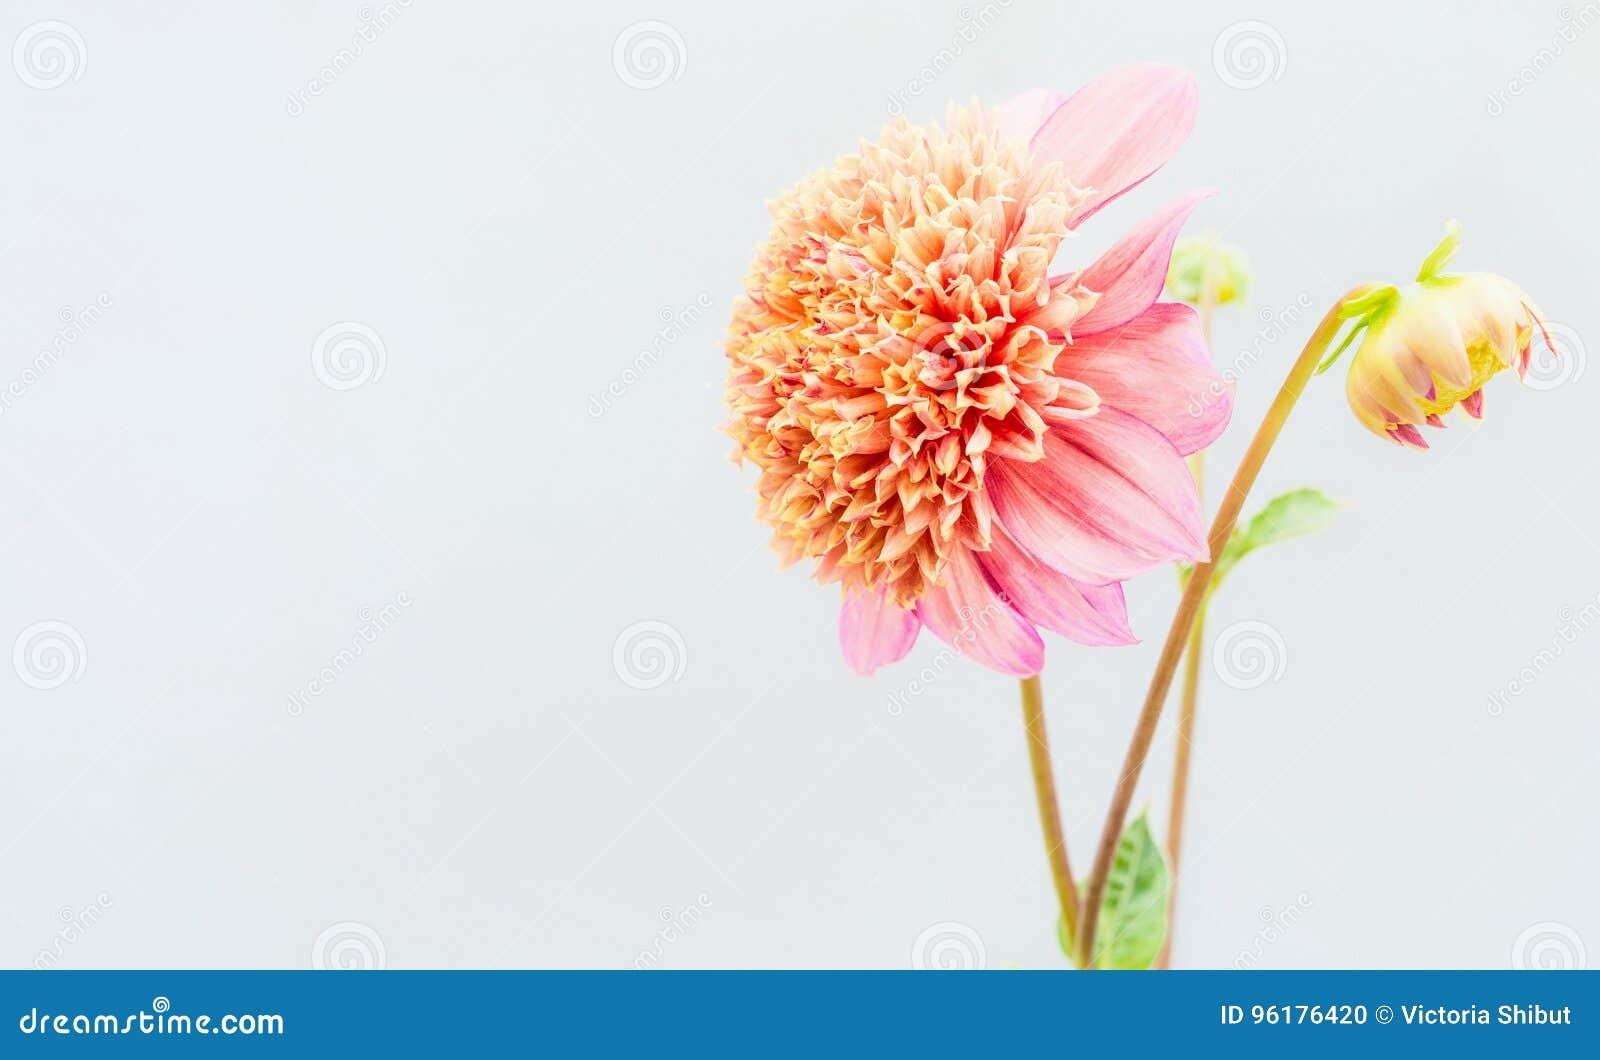 Beautiful pink Dahlia flowers at light wall